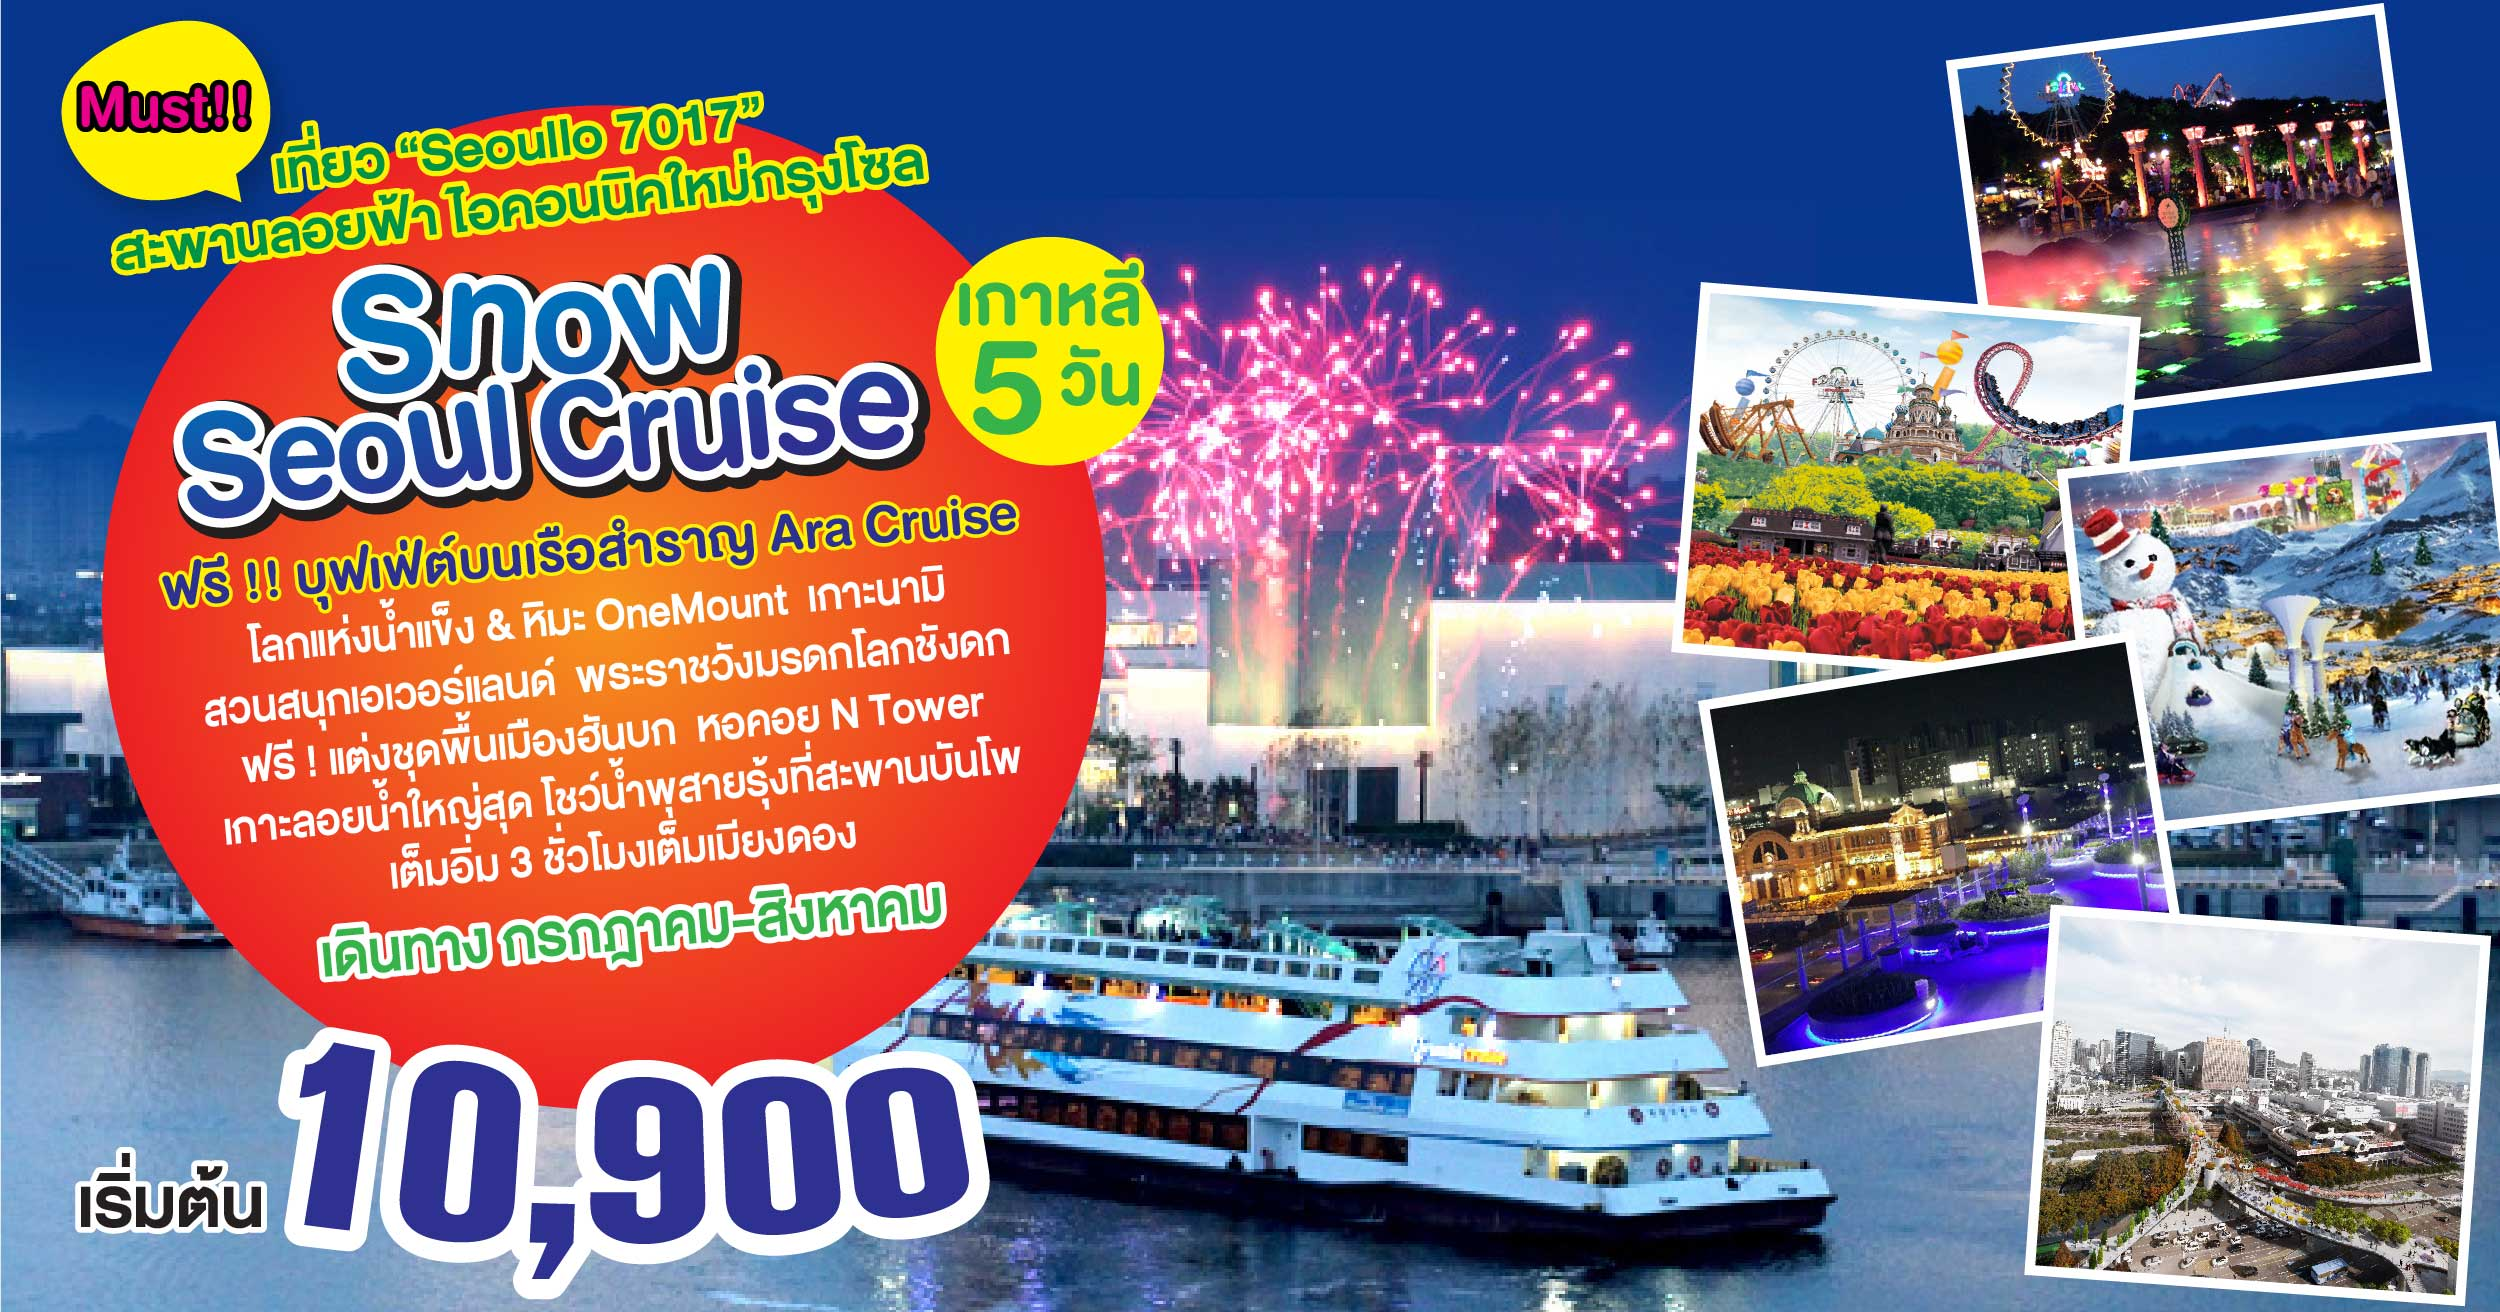 Snow Seoul Cruise- แก้ 10900